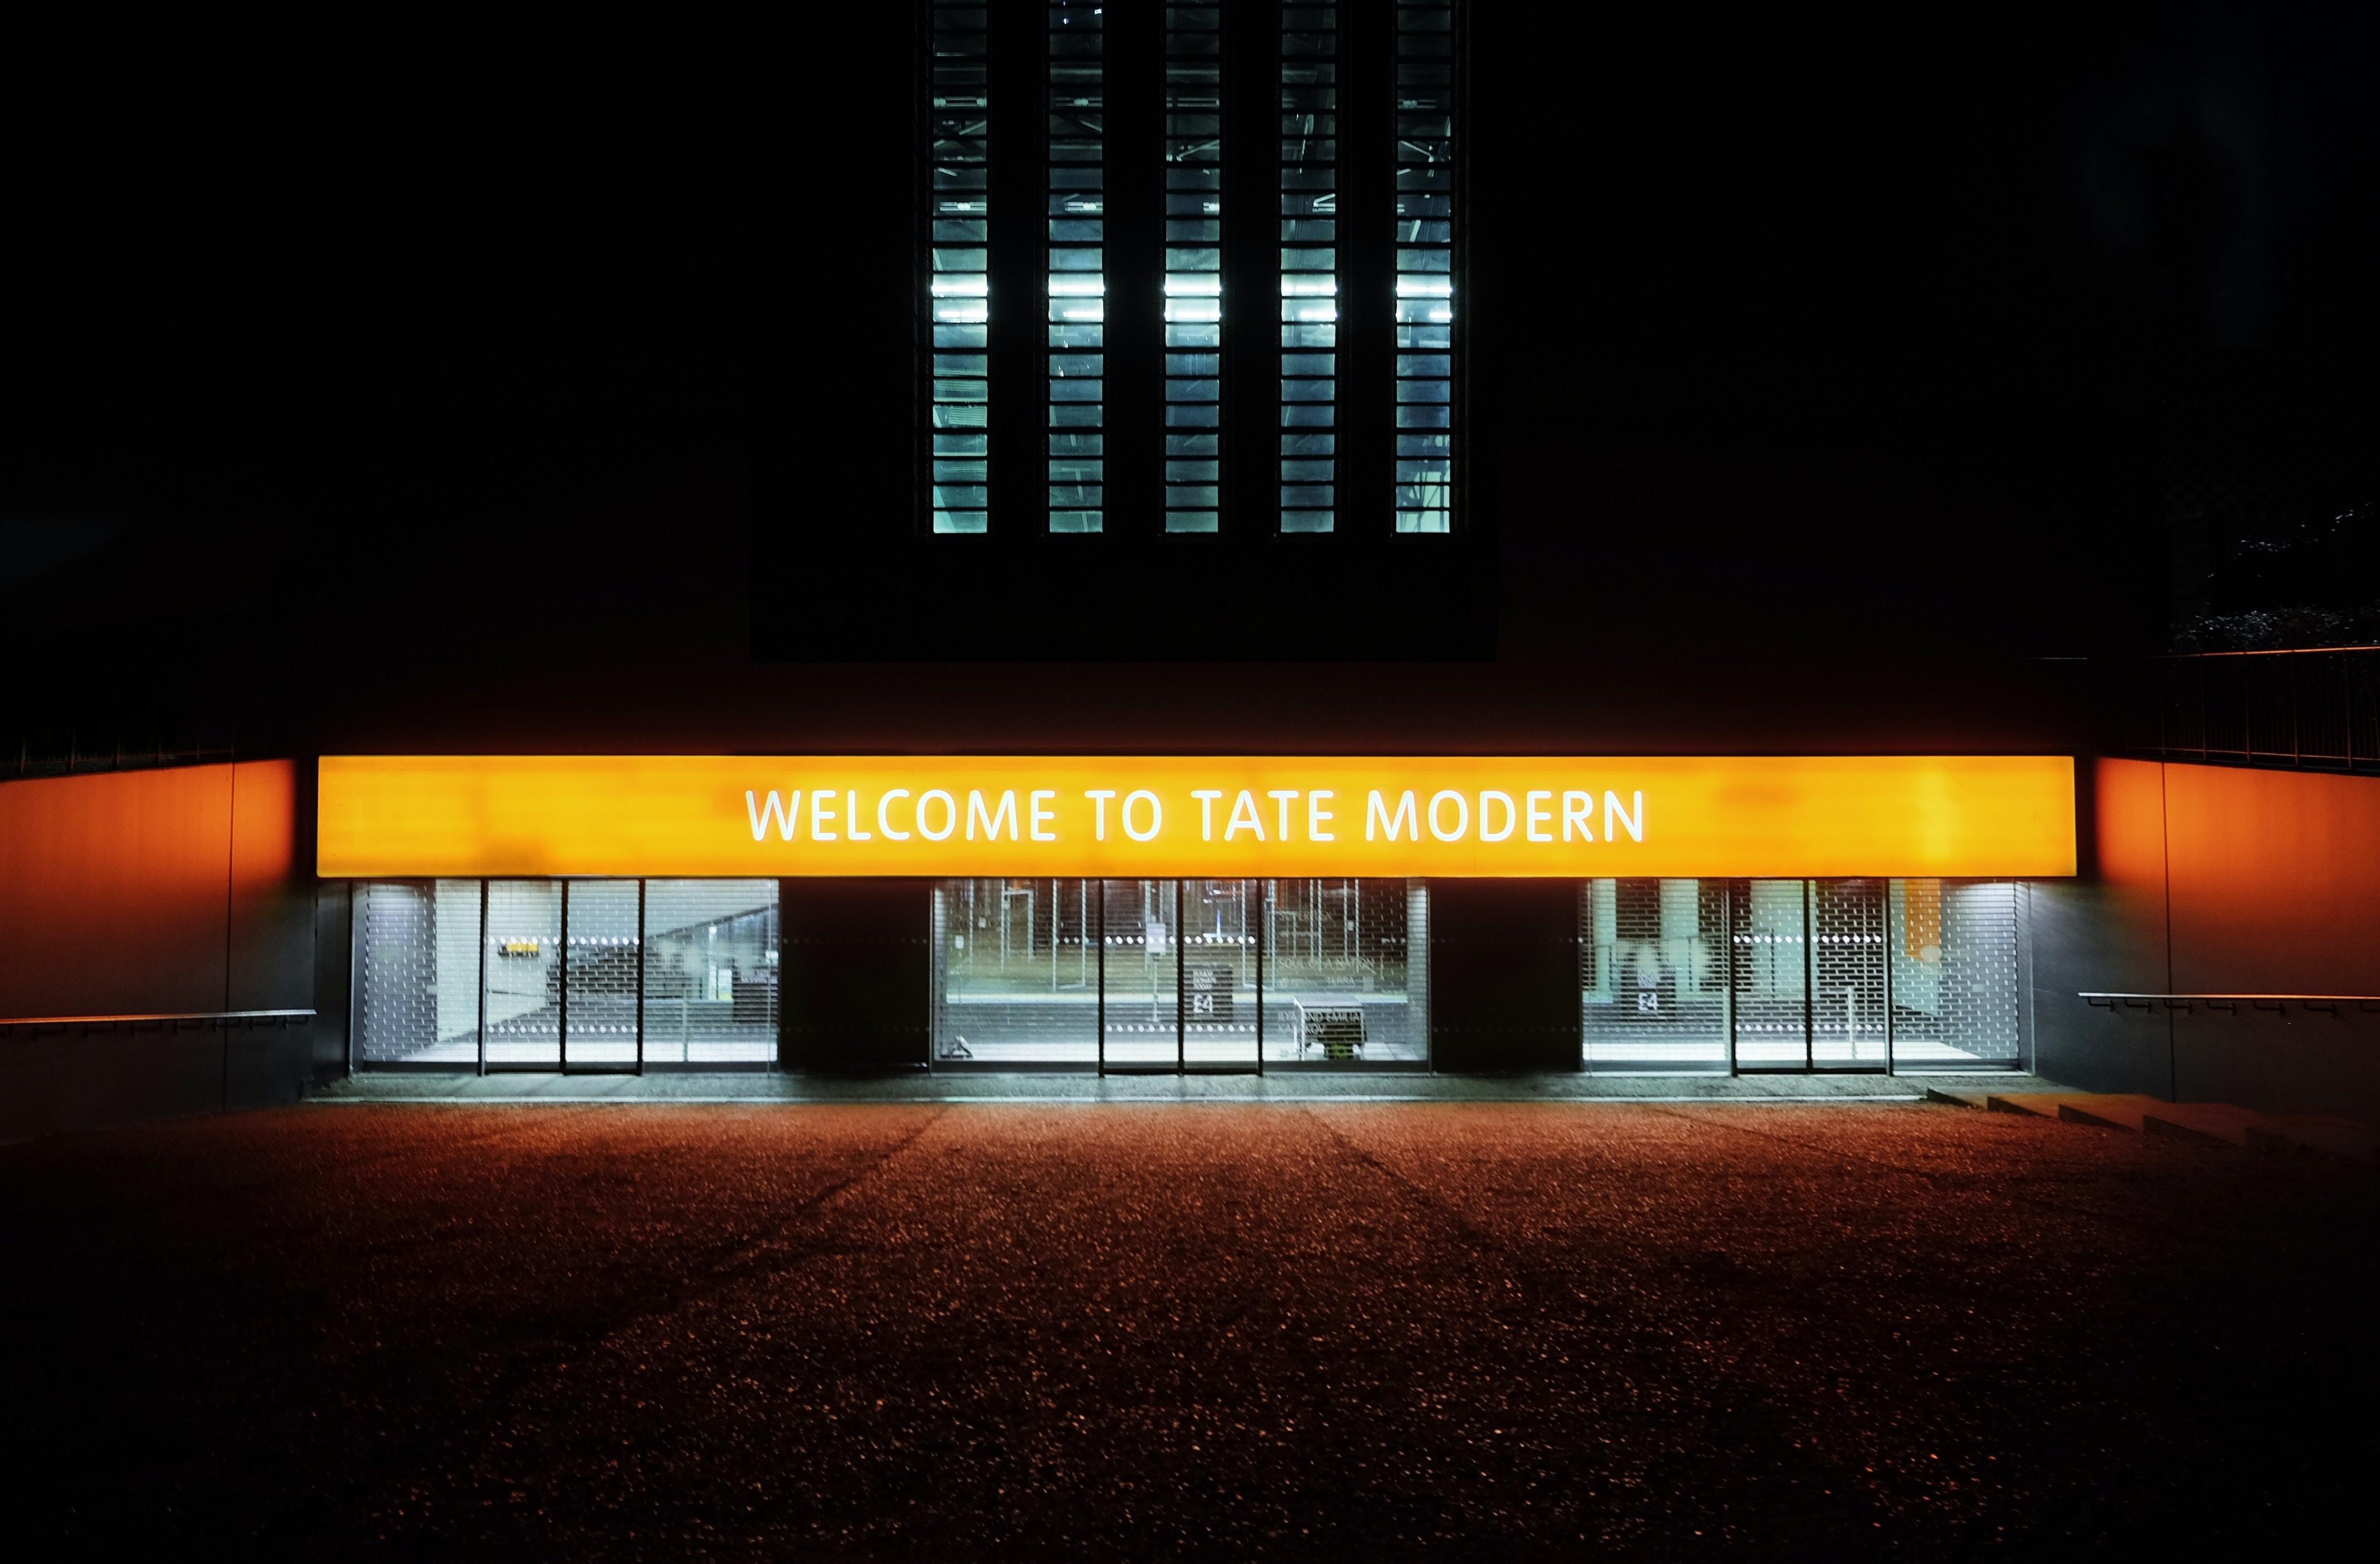 Tate Modern building